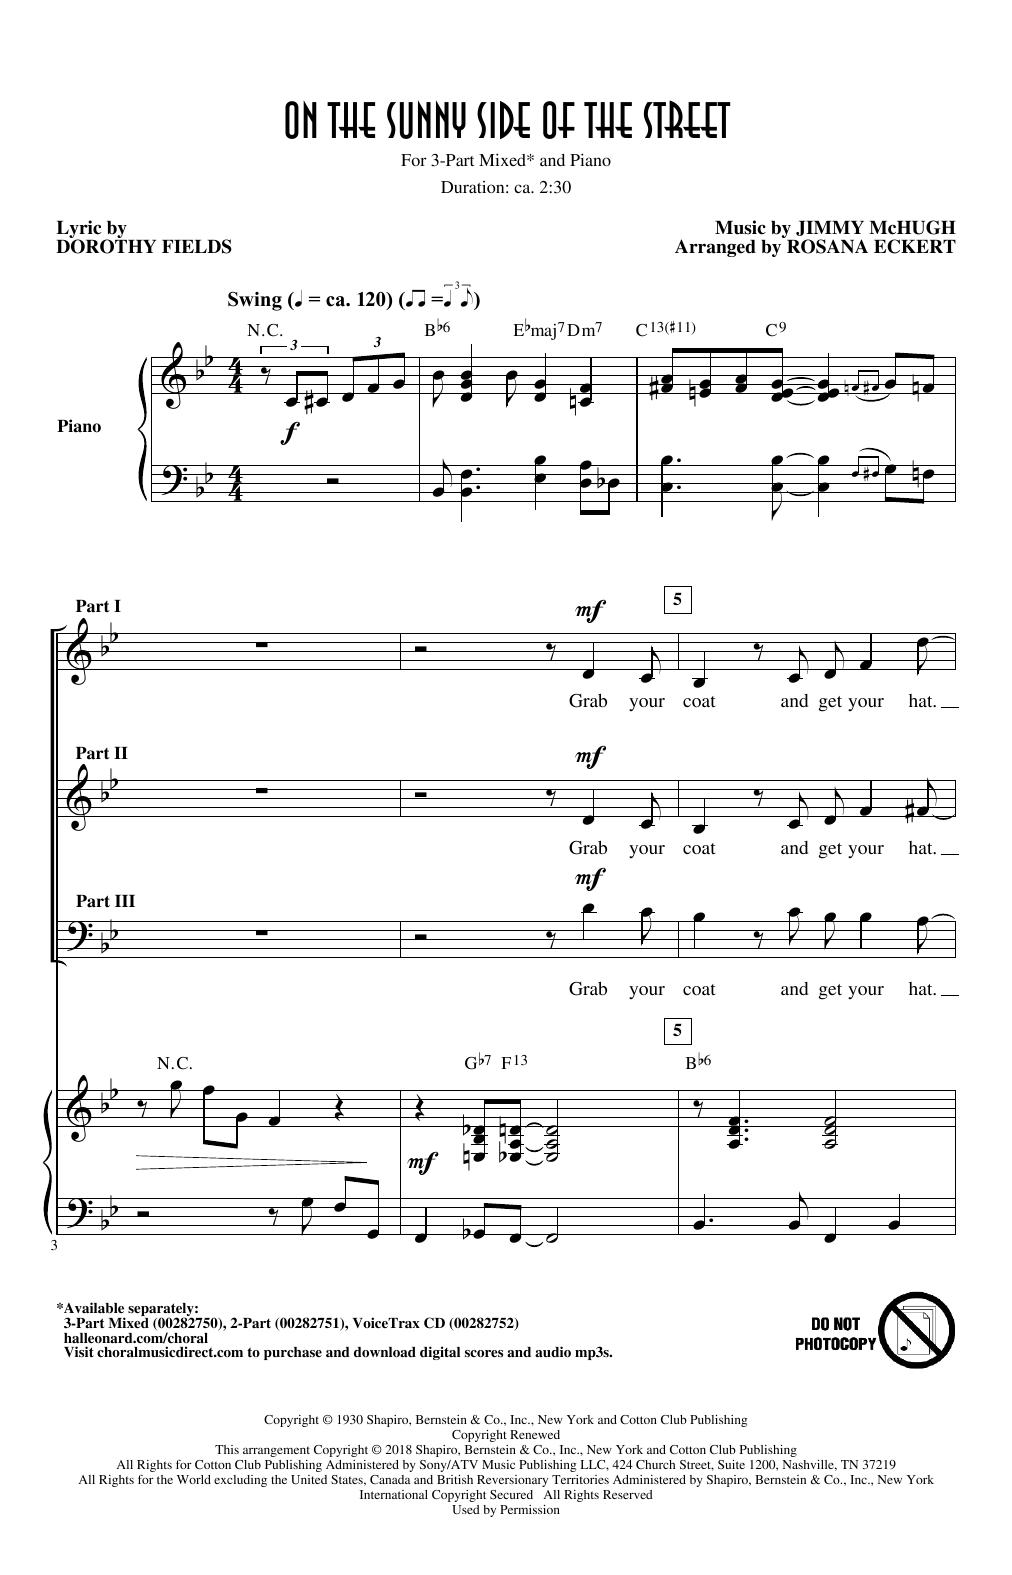 On The Sunny Side Of The Street (arr. Rosana Eckert) (3-Part Mixed Choir)